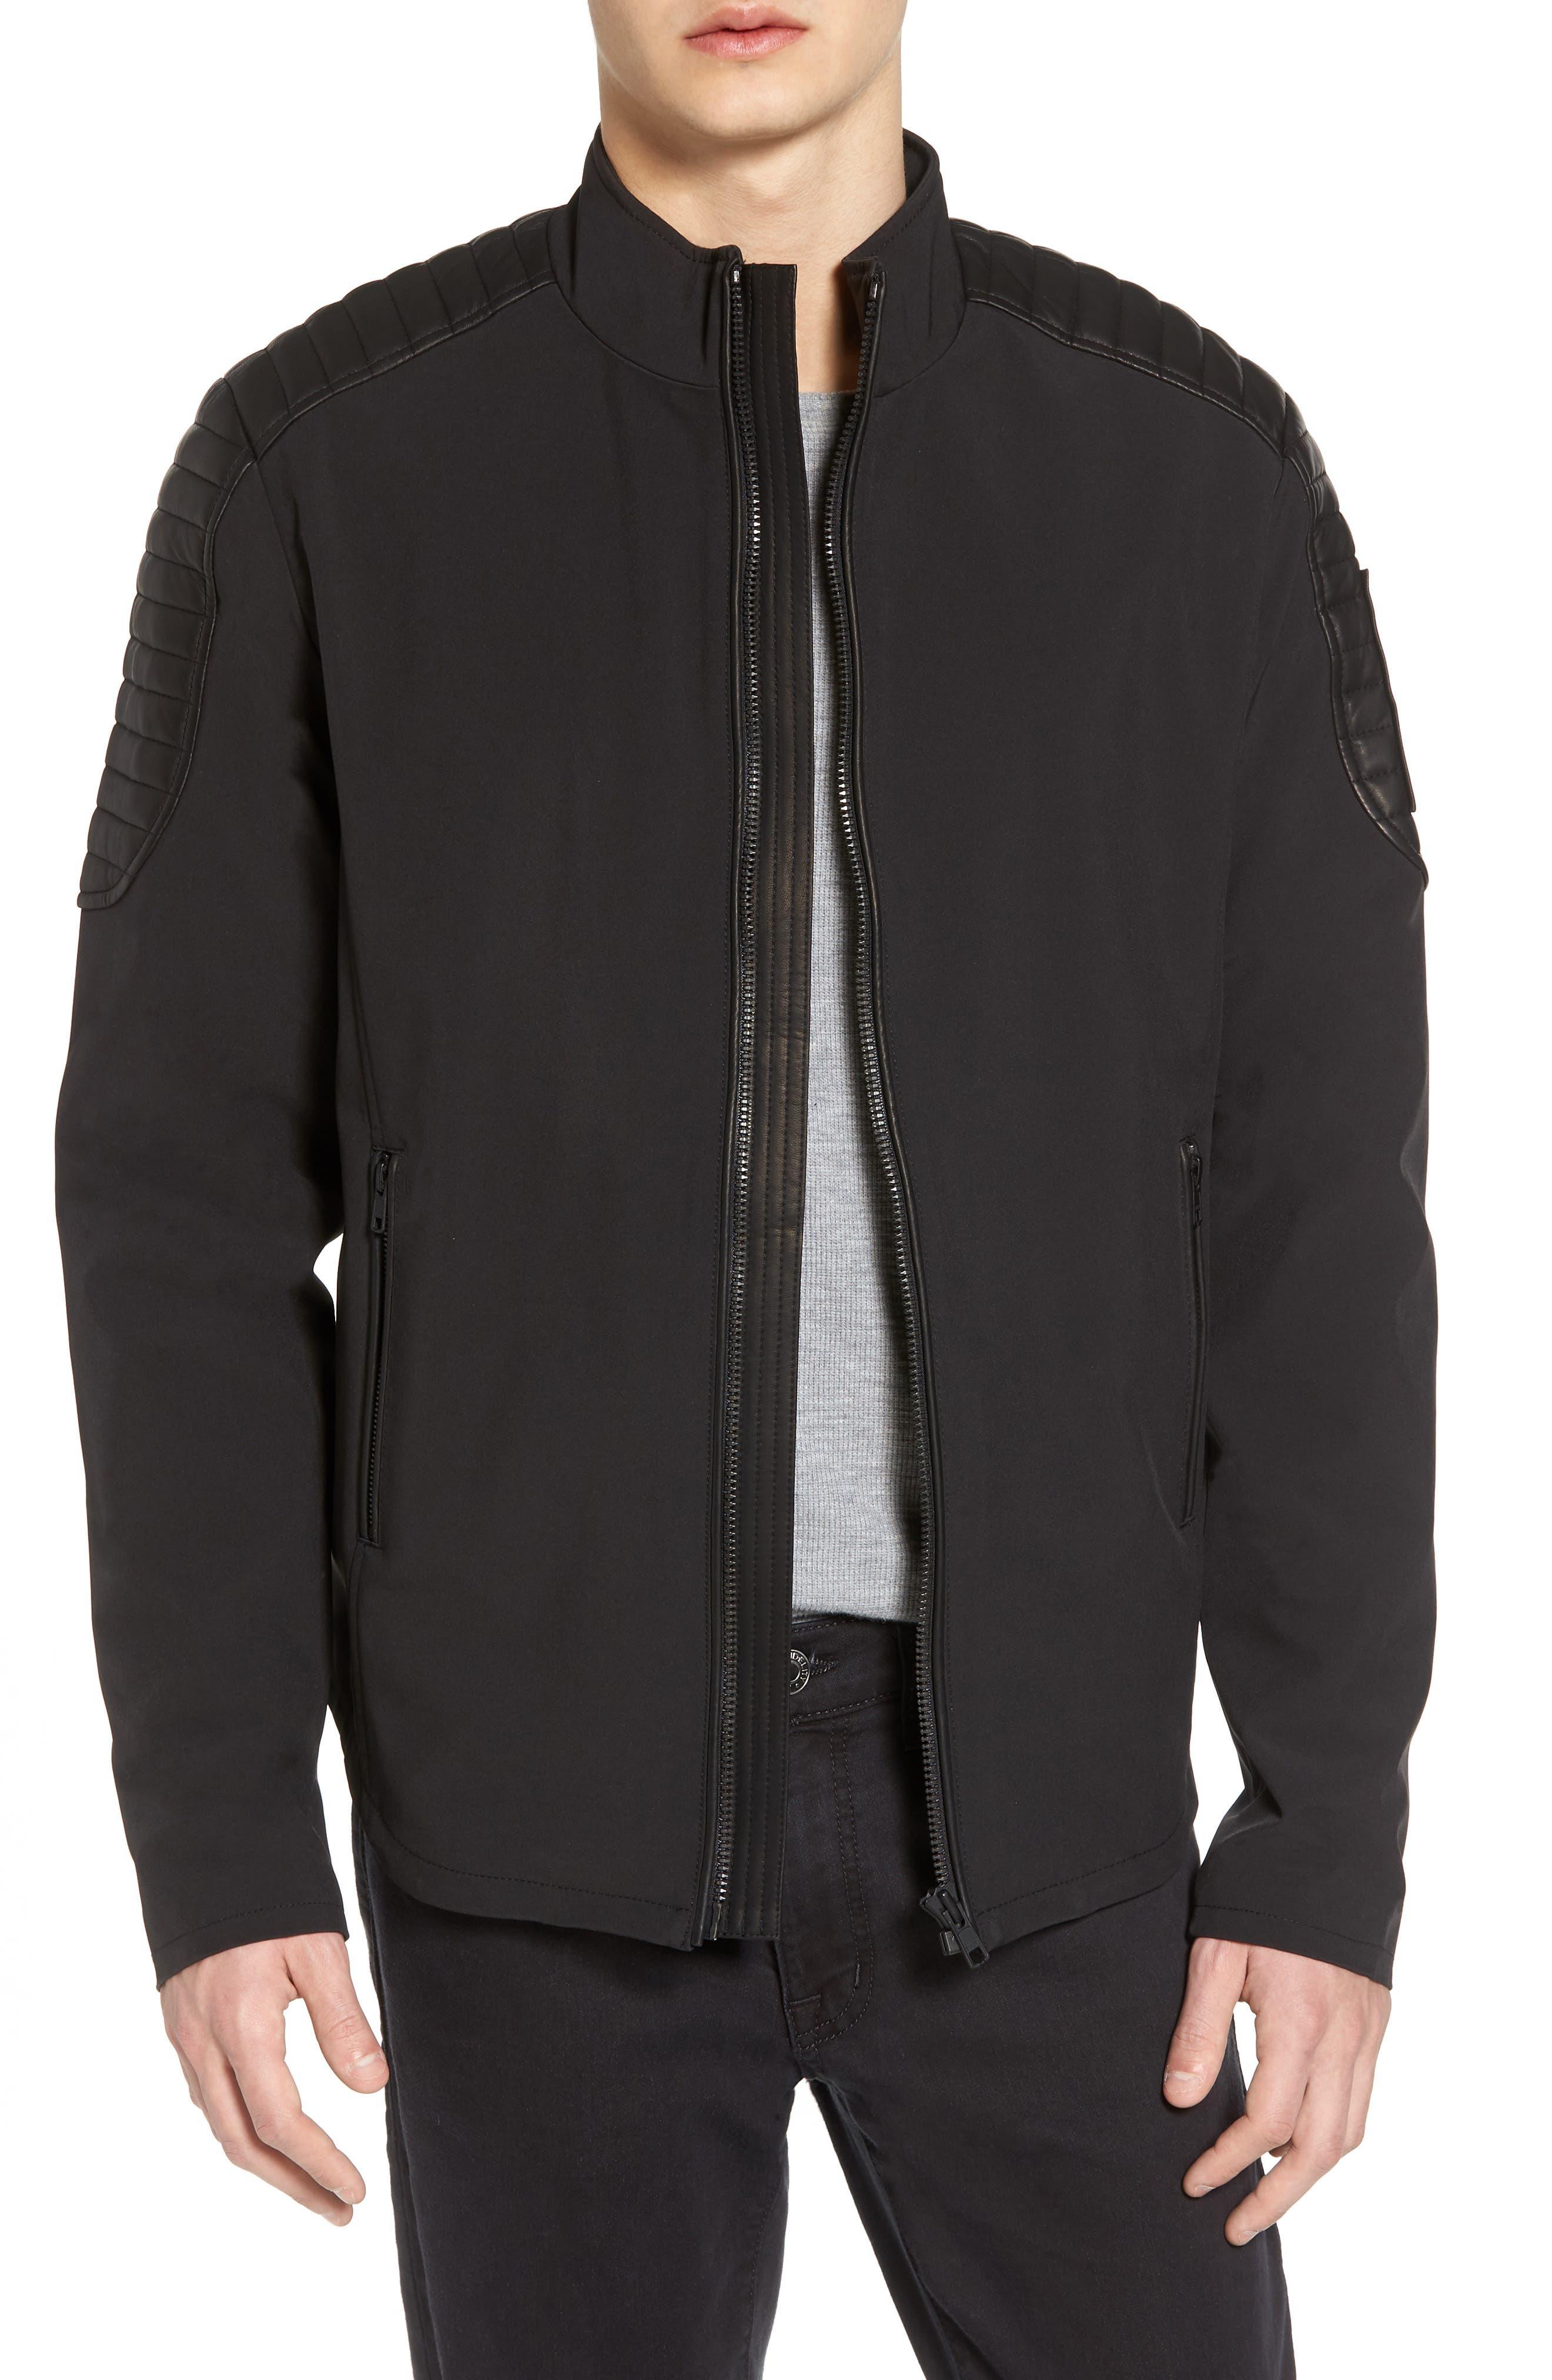 Grindstone Water Repellent Jacket,                         Main,                         color, 001